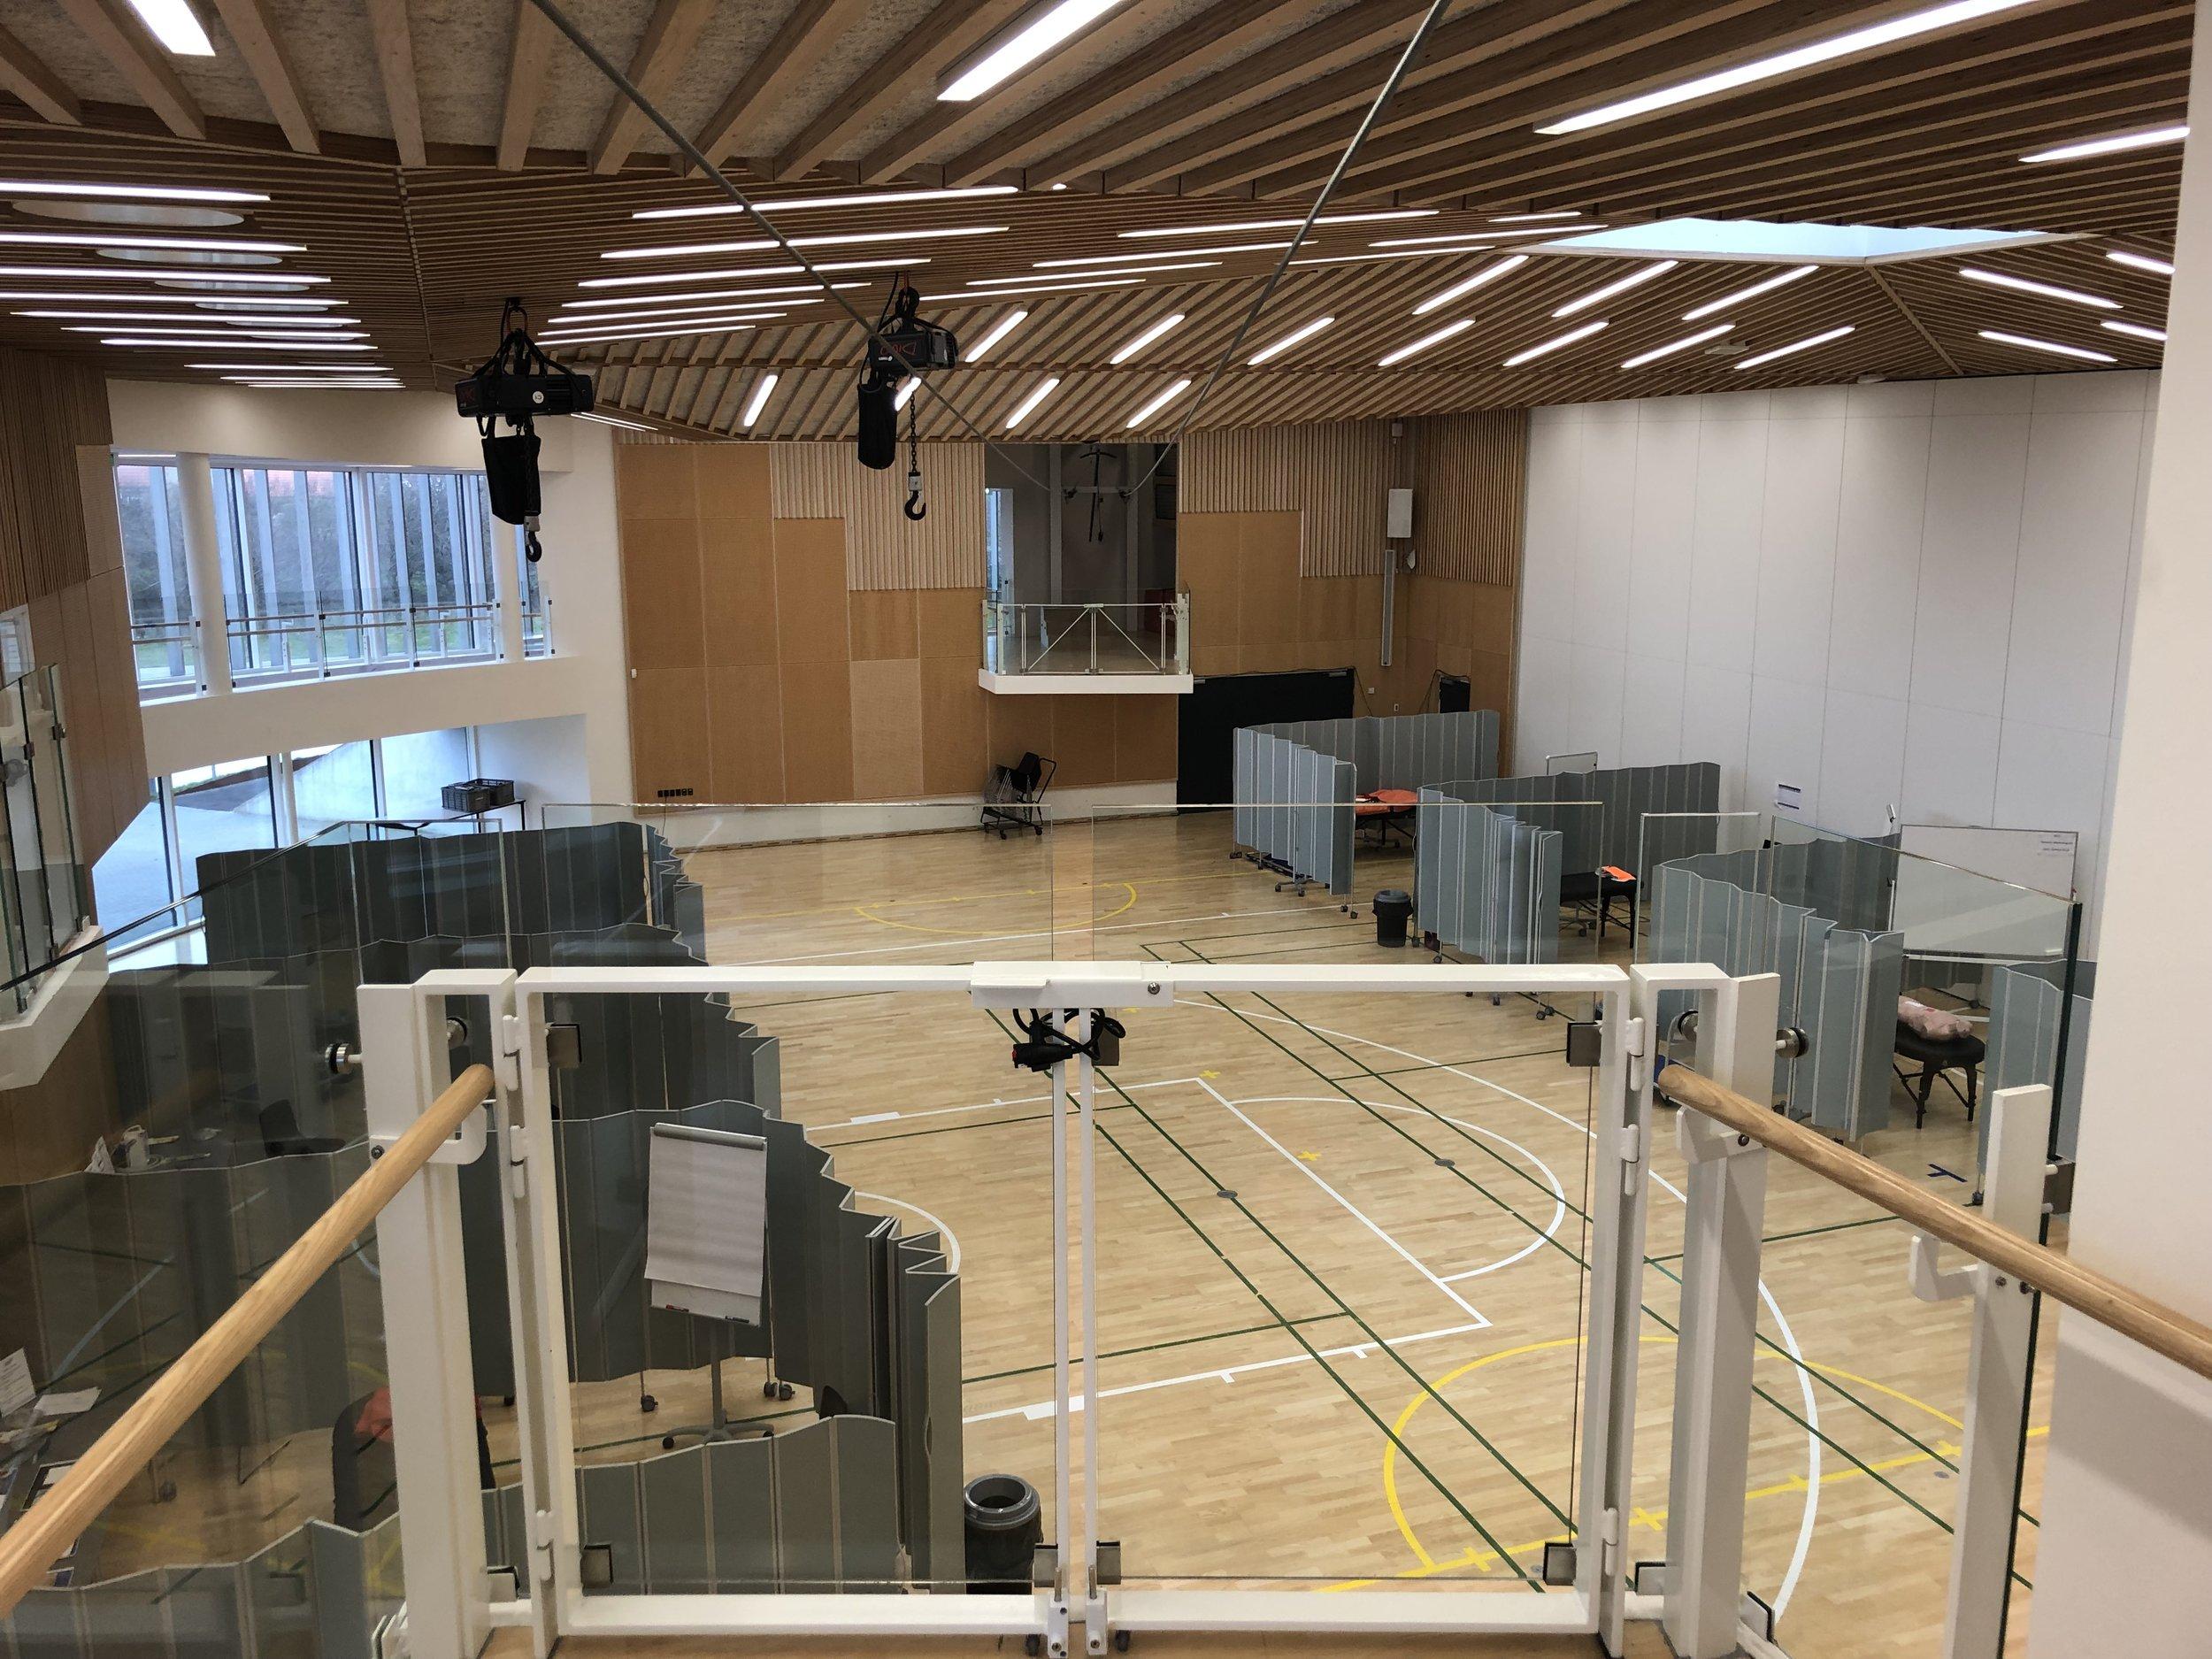 Innovative Sports Gymnasium